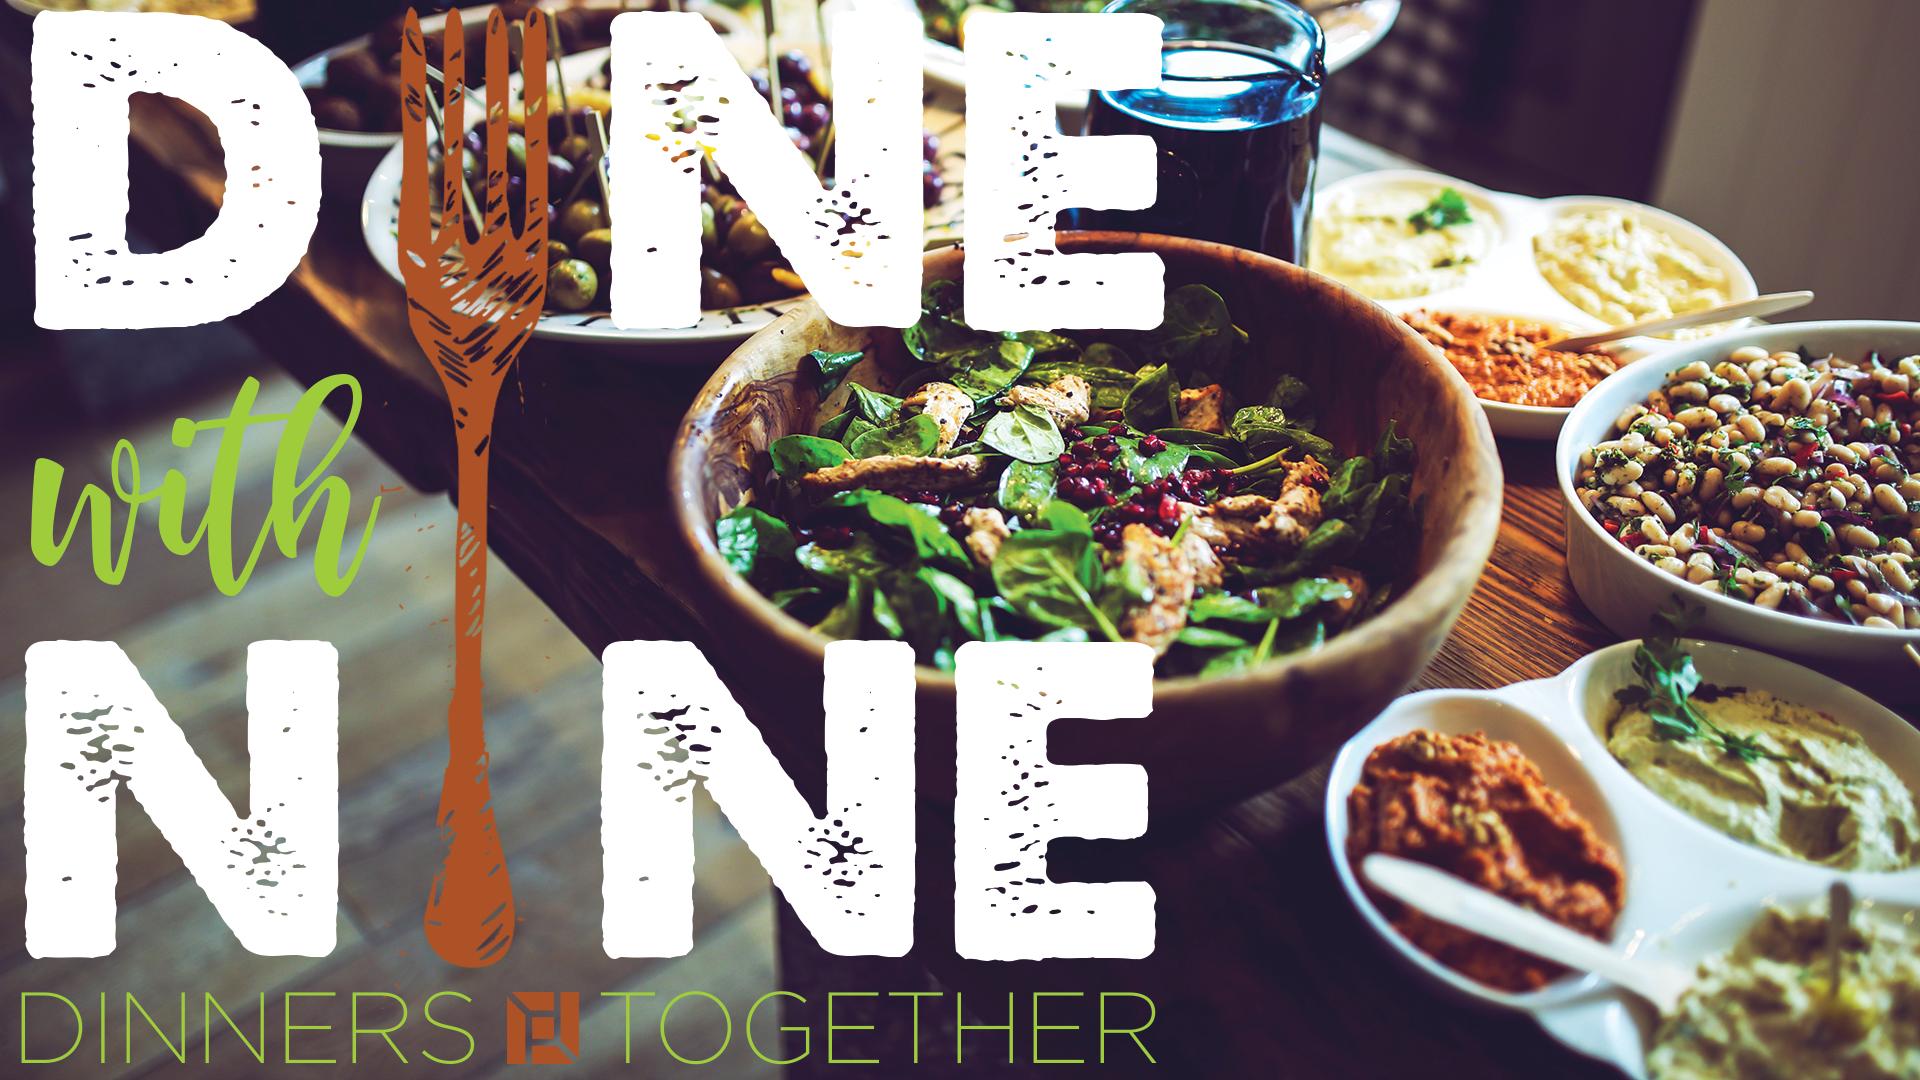 Dine with nine